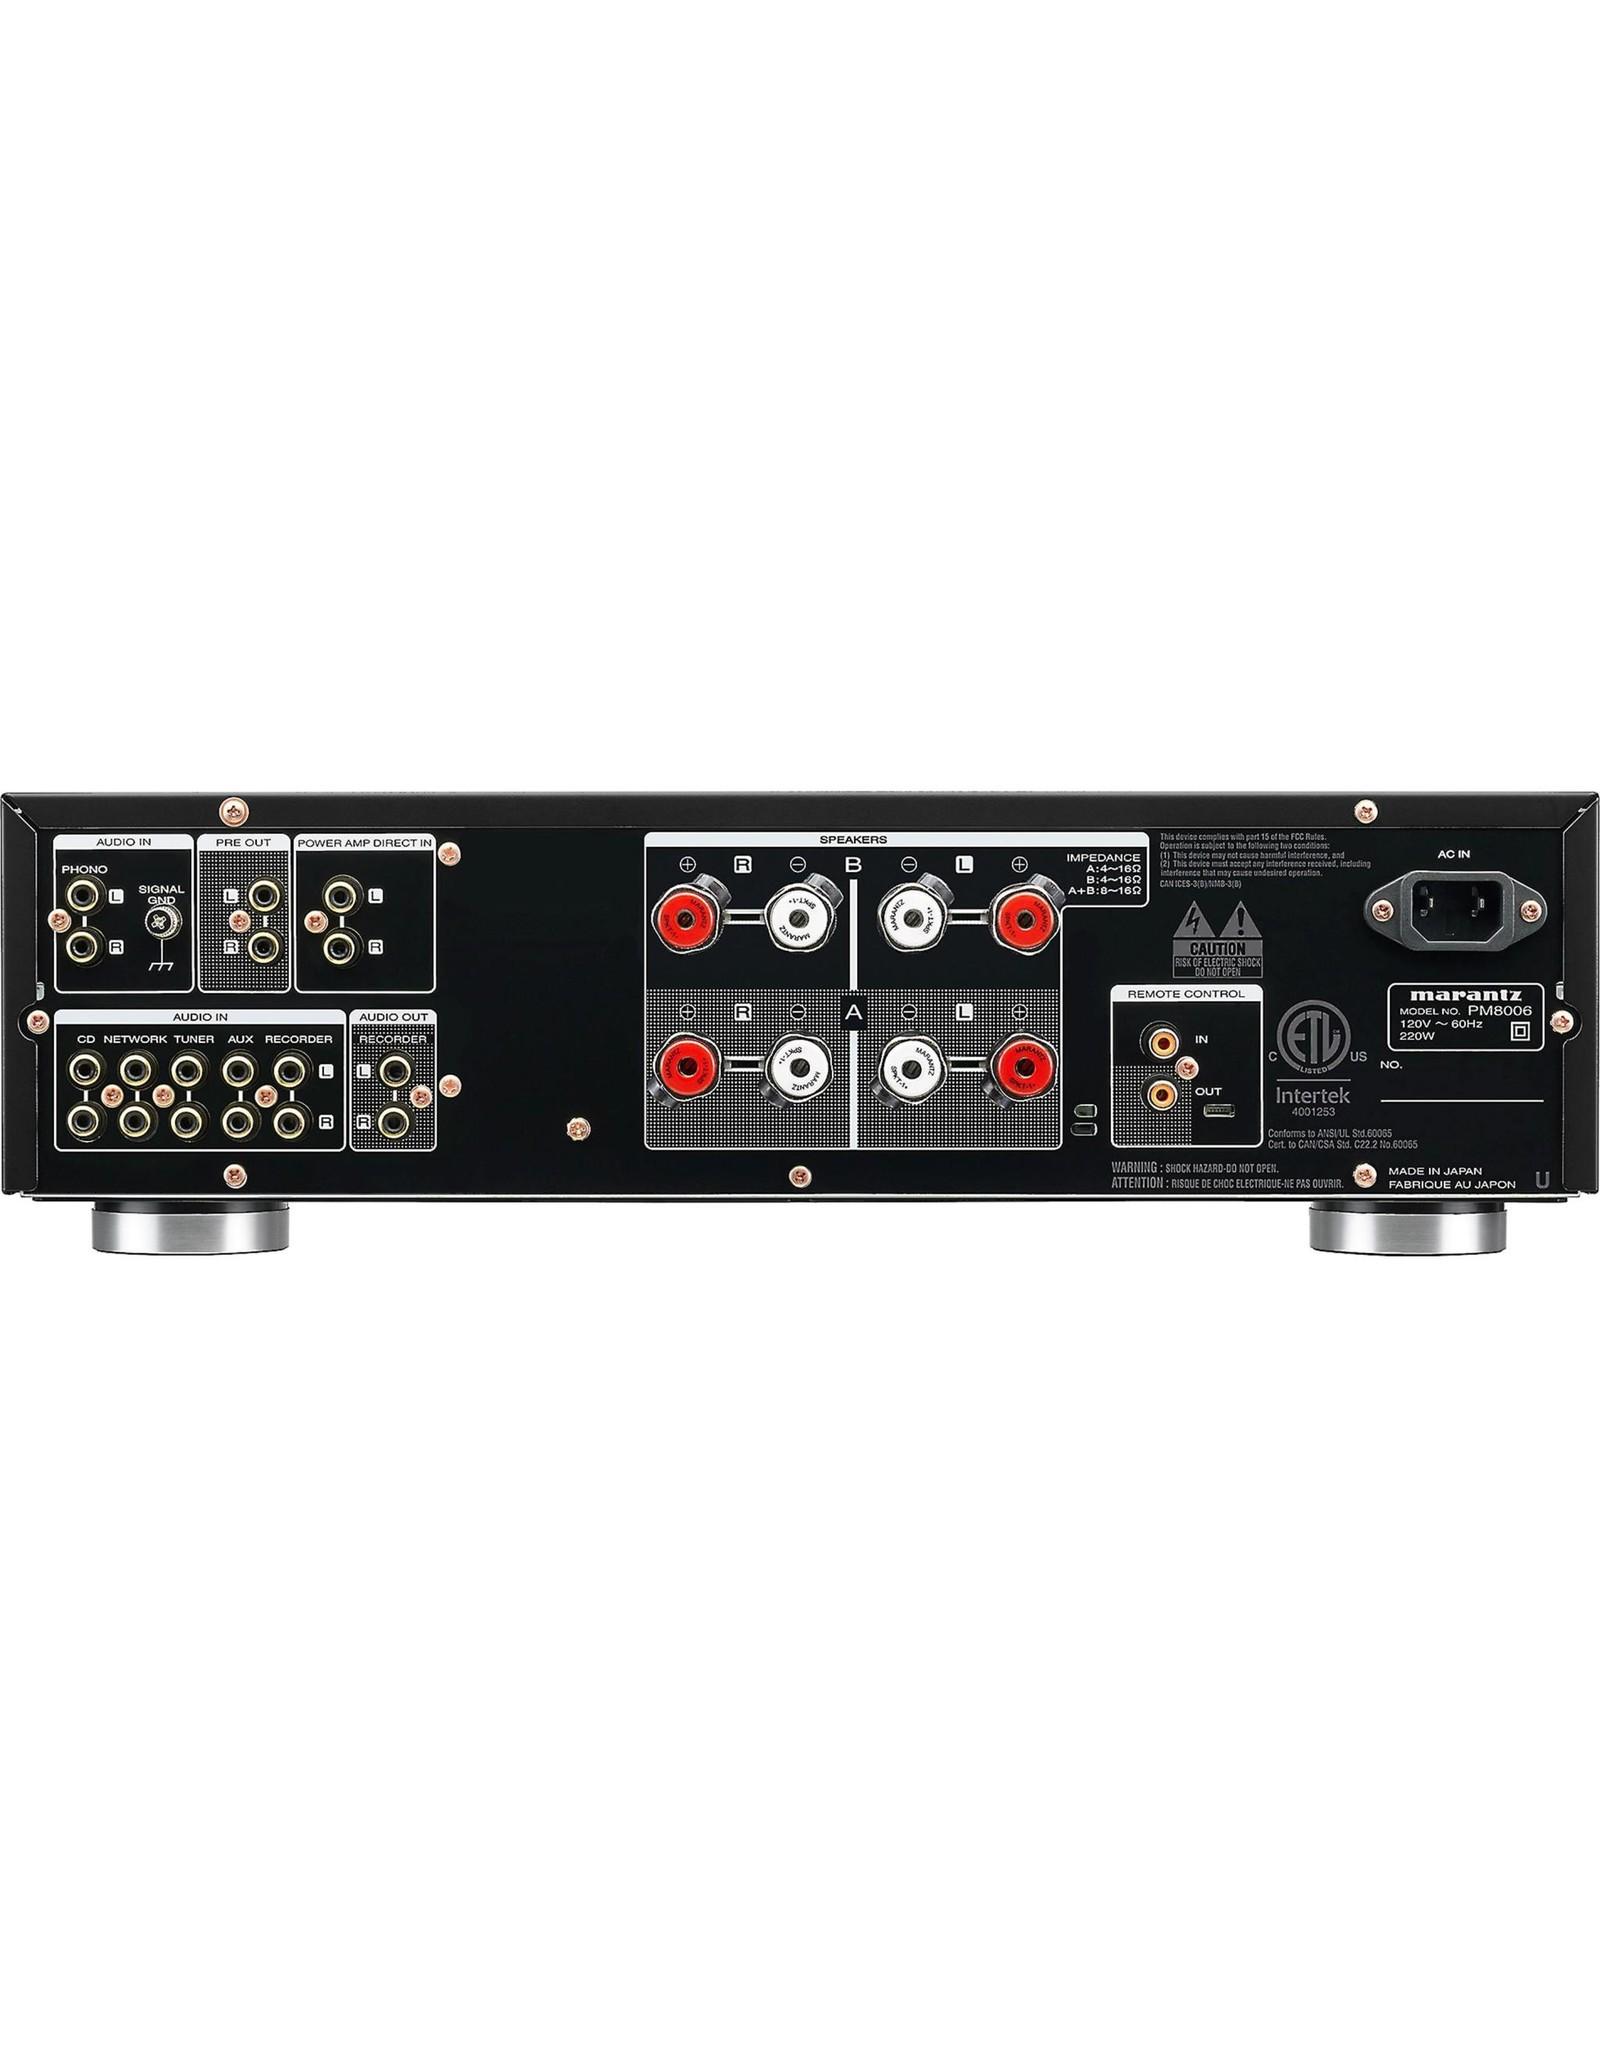 Marantz Marantz PM8006 Integrated Amplifier